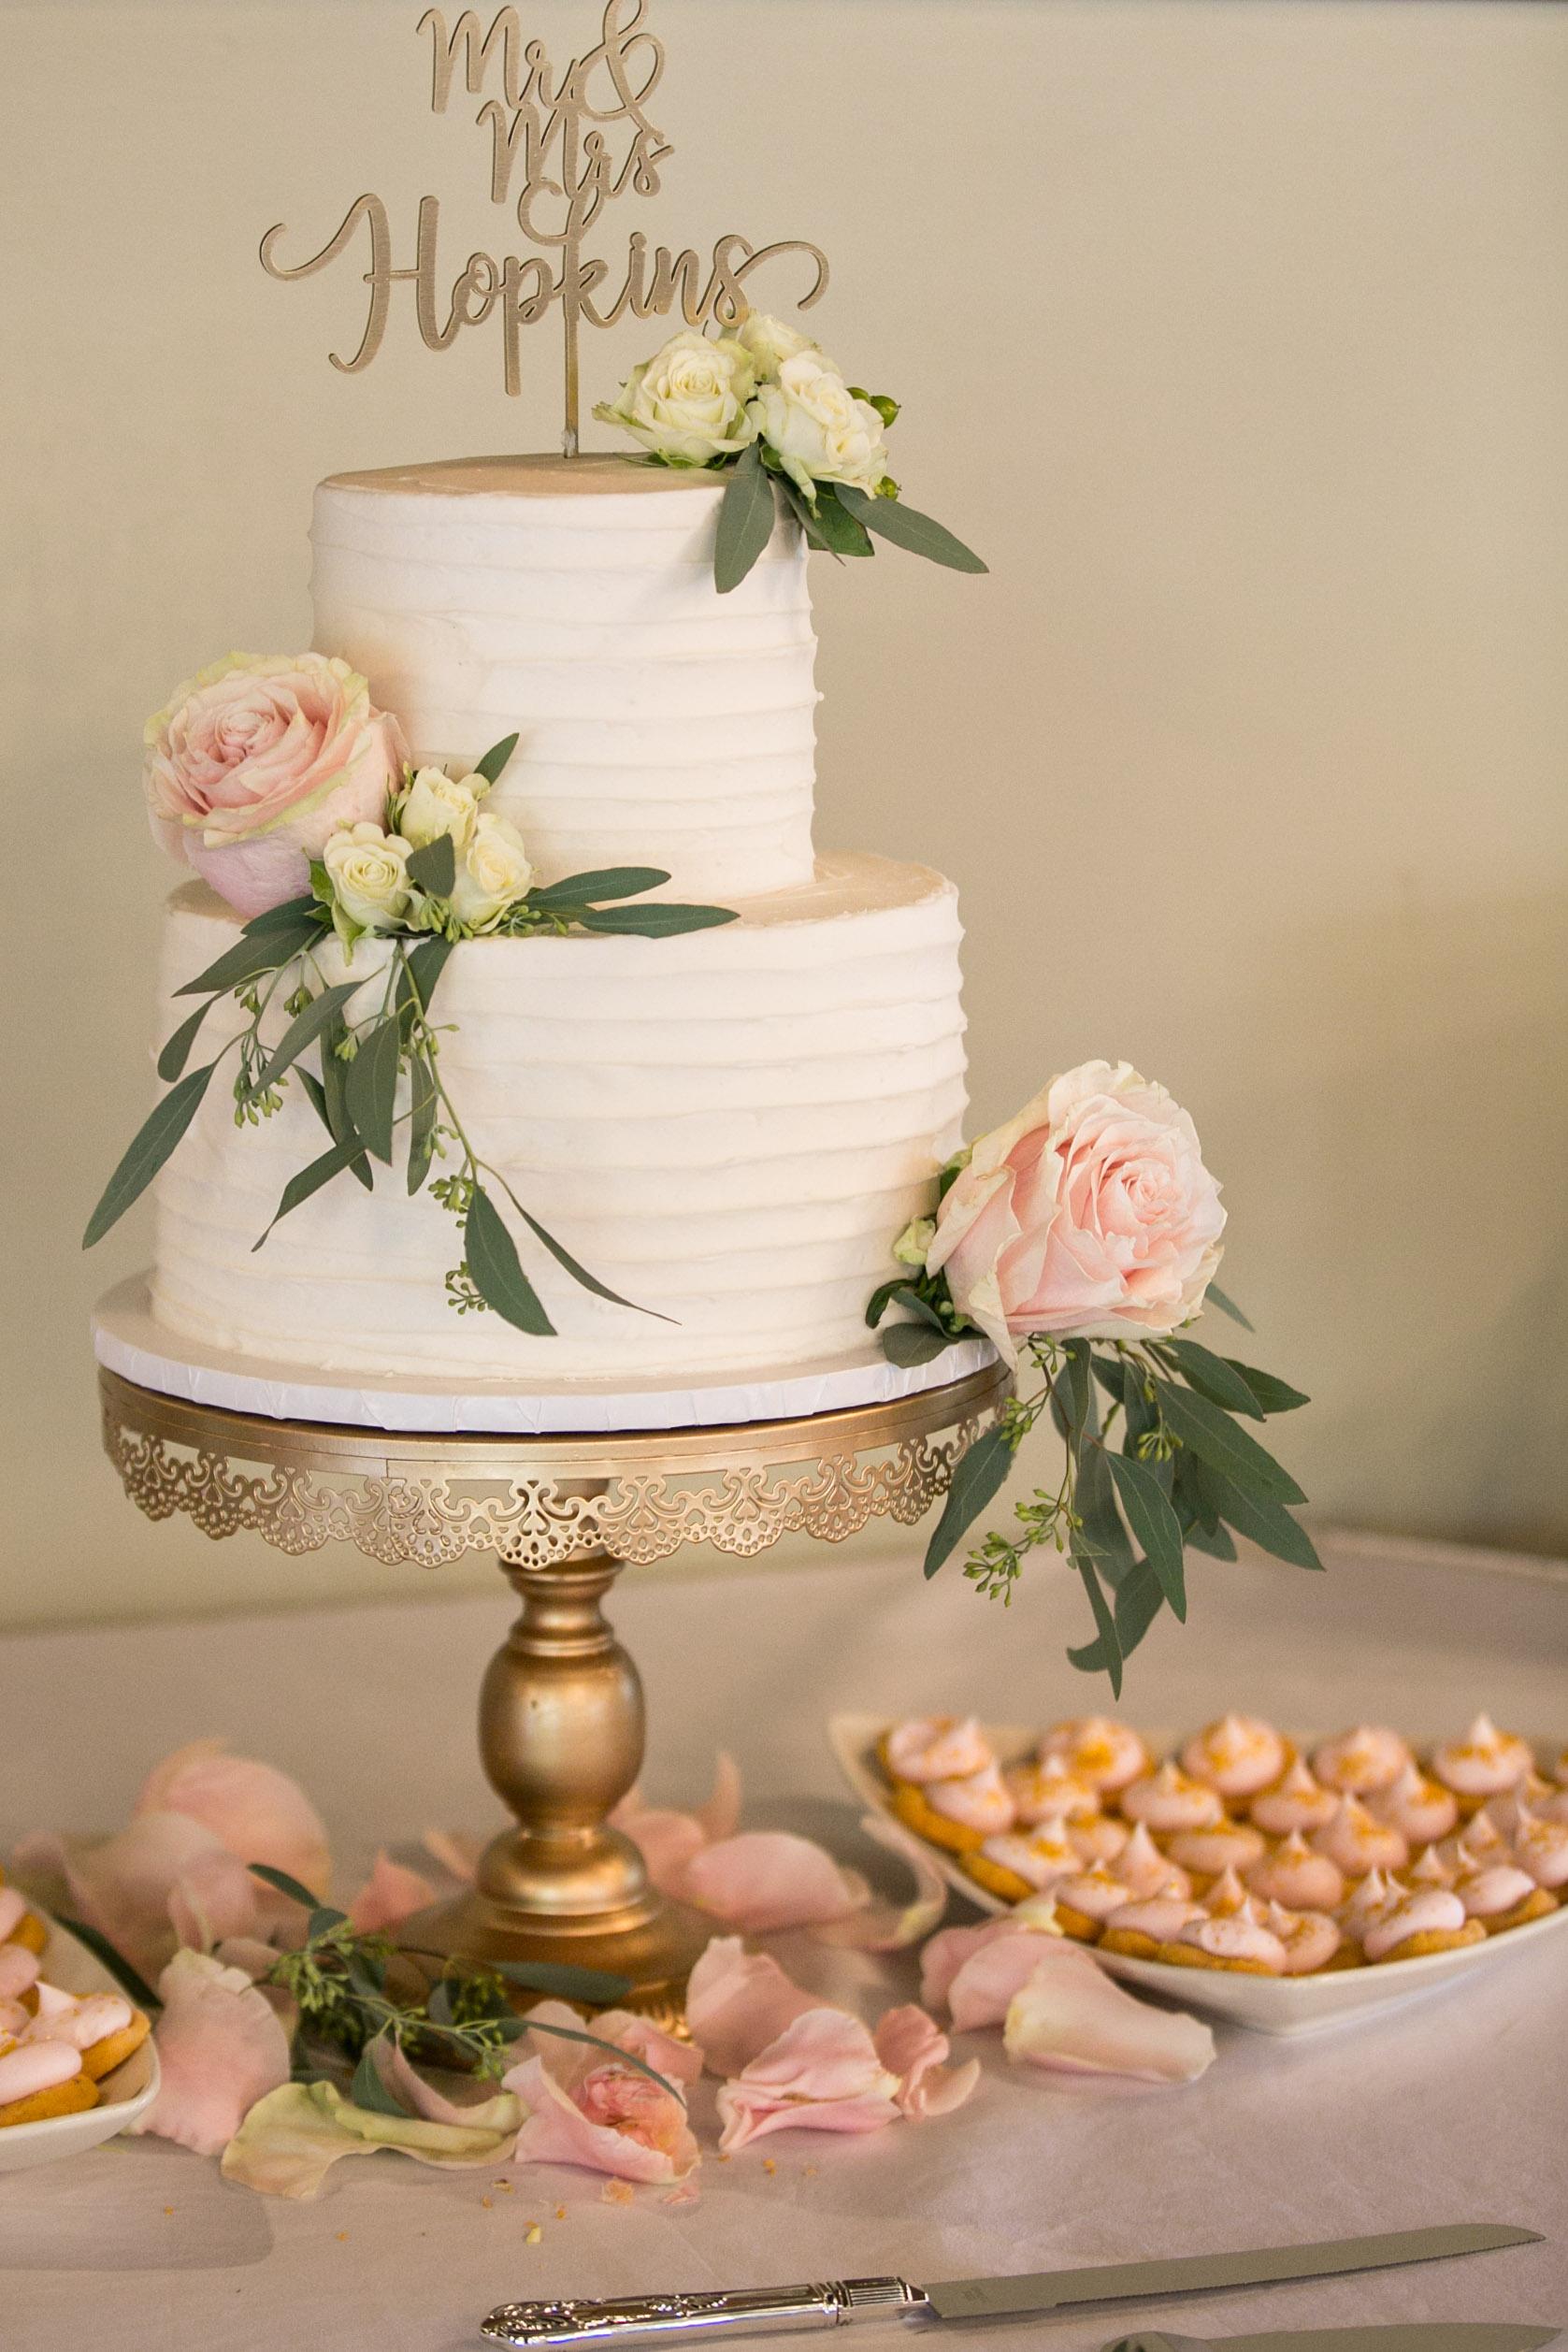 detail shot of wedding cake and desserts